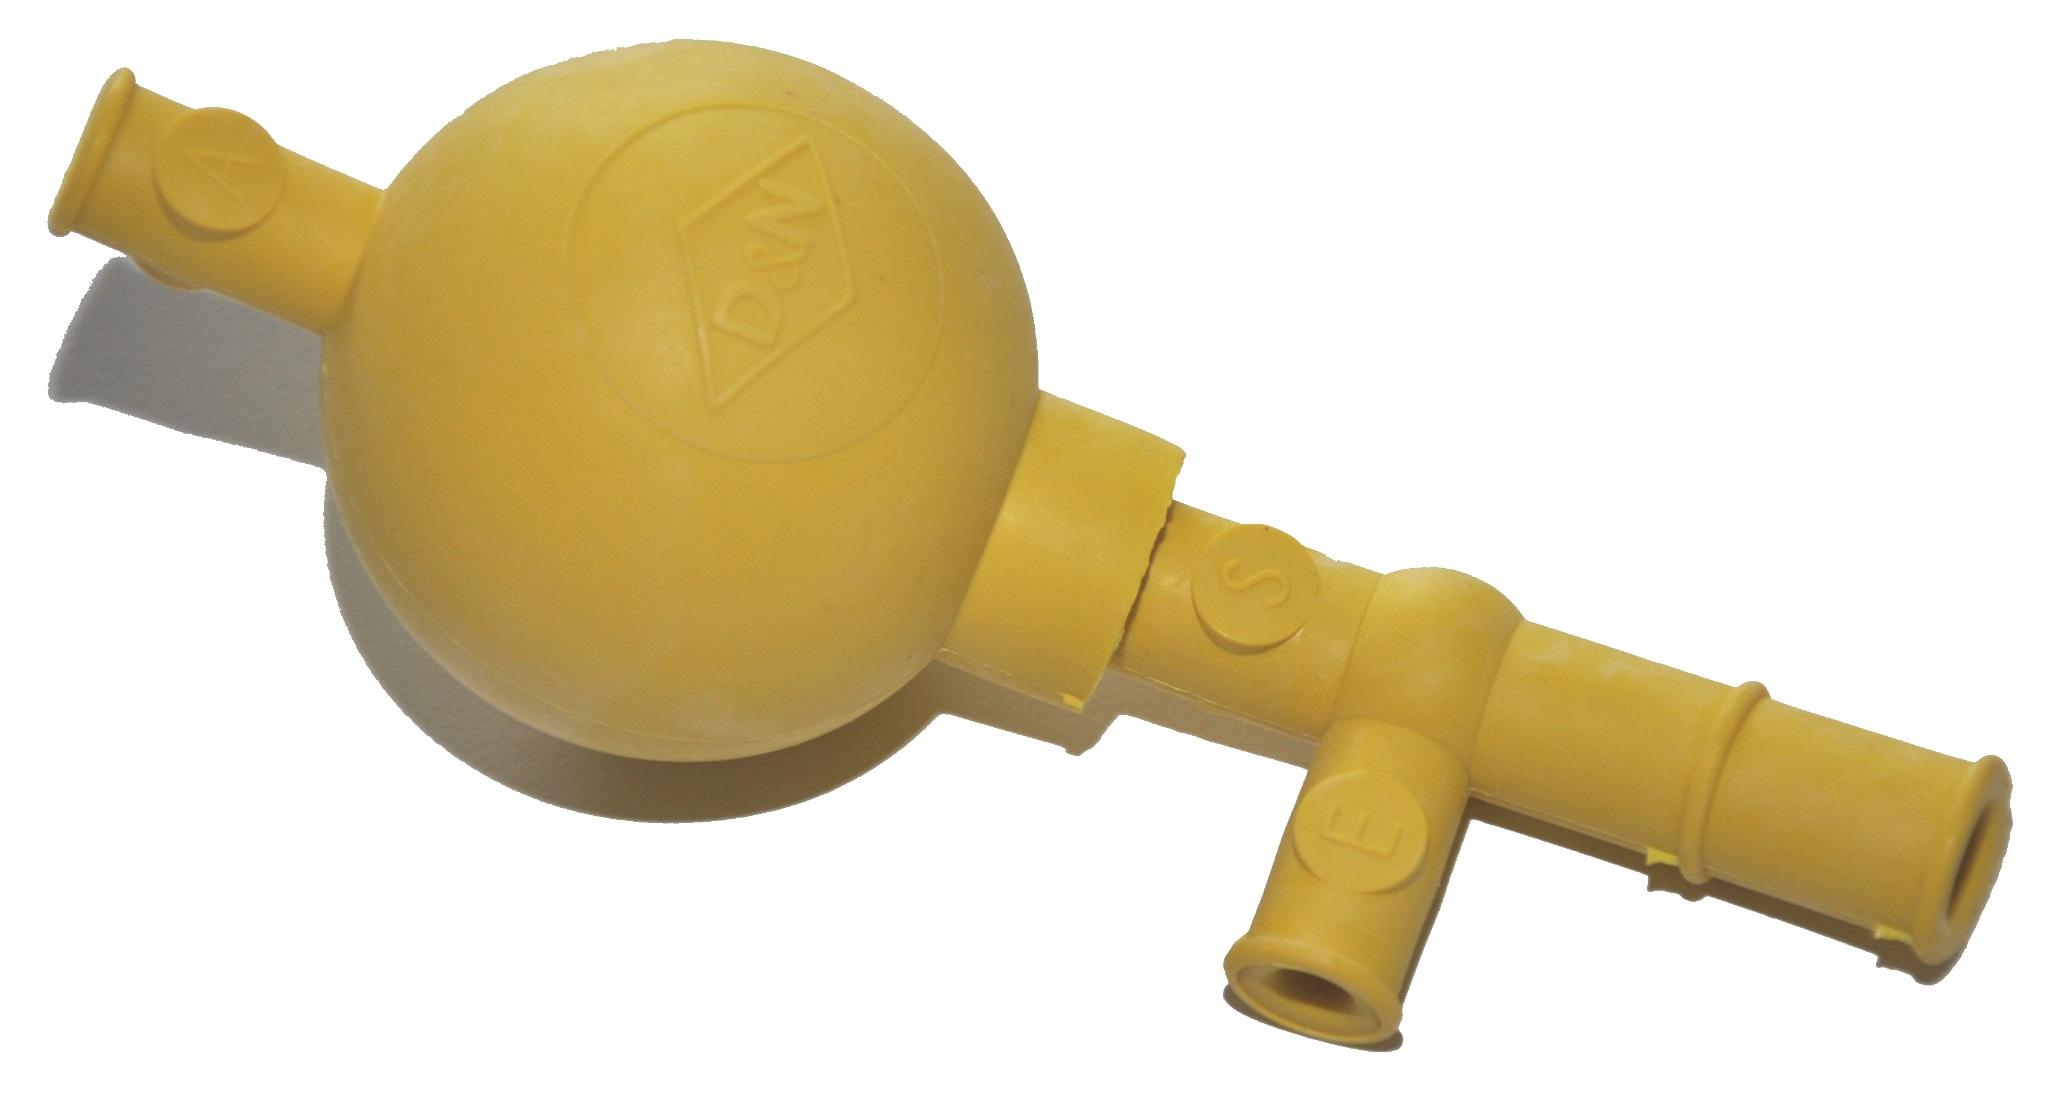 Peleusball Pipettierball Gelb, Standard, für 100ml Pipetten, Naturkautschuk